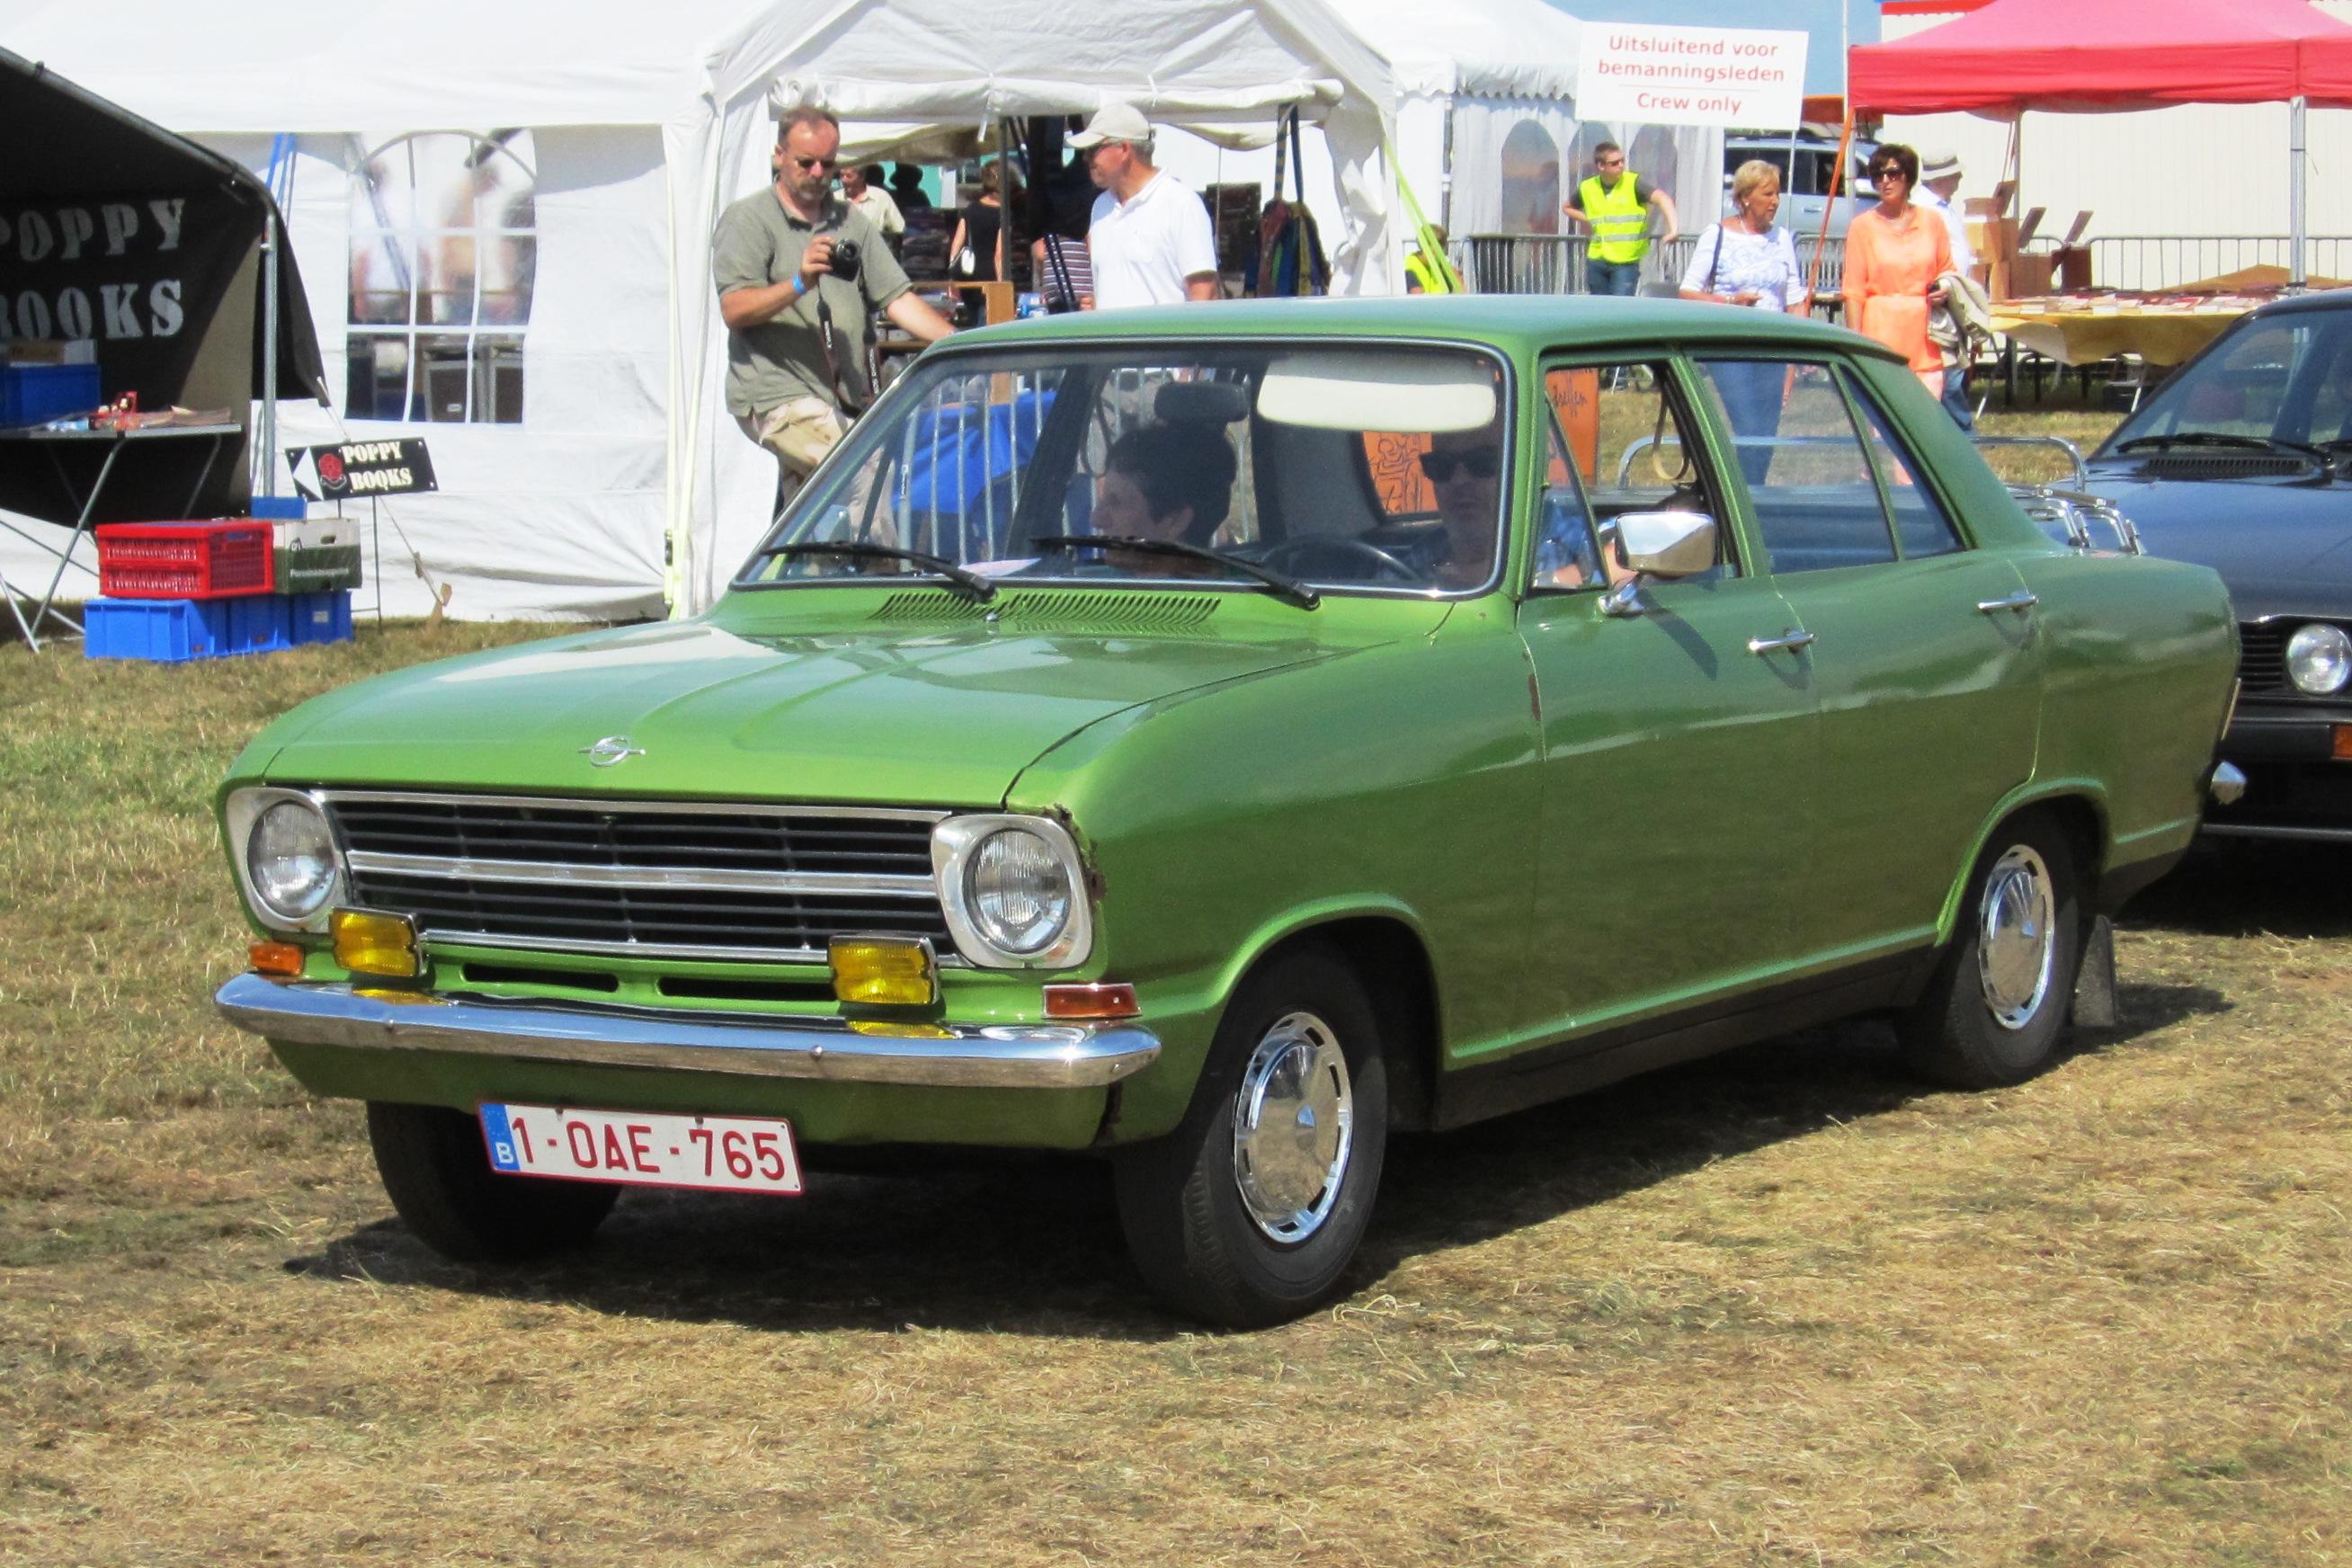 Opel Kadett Wikipedia